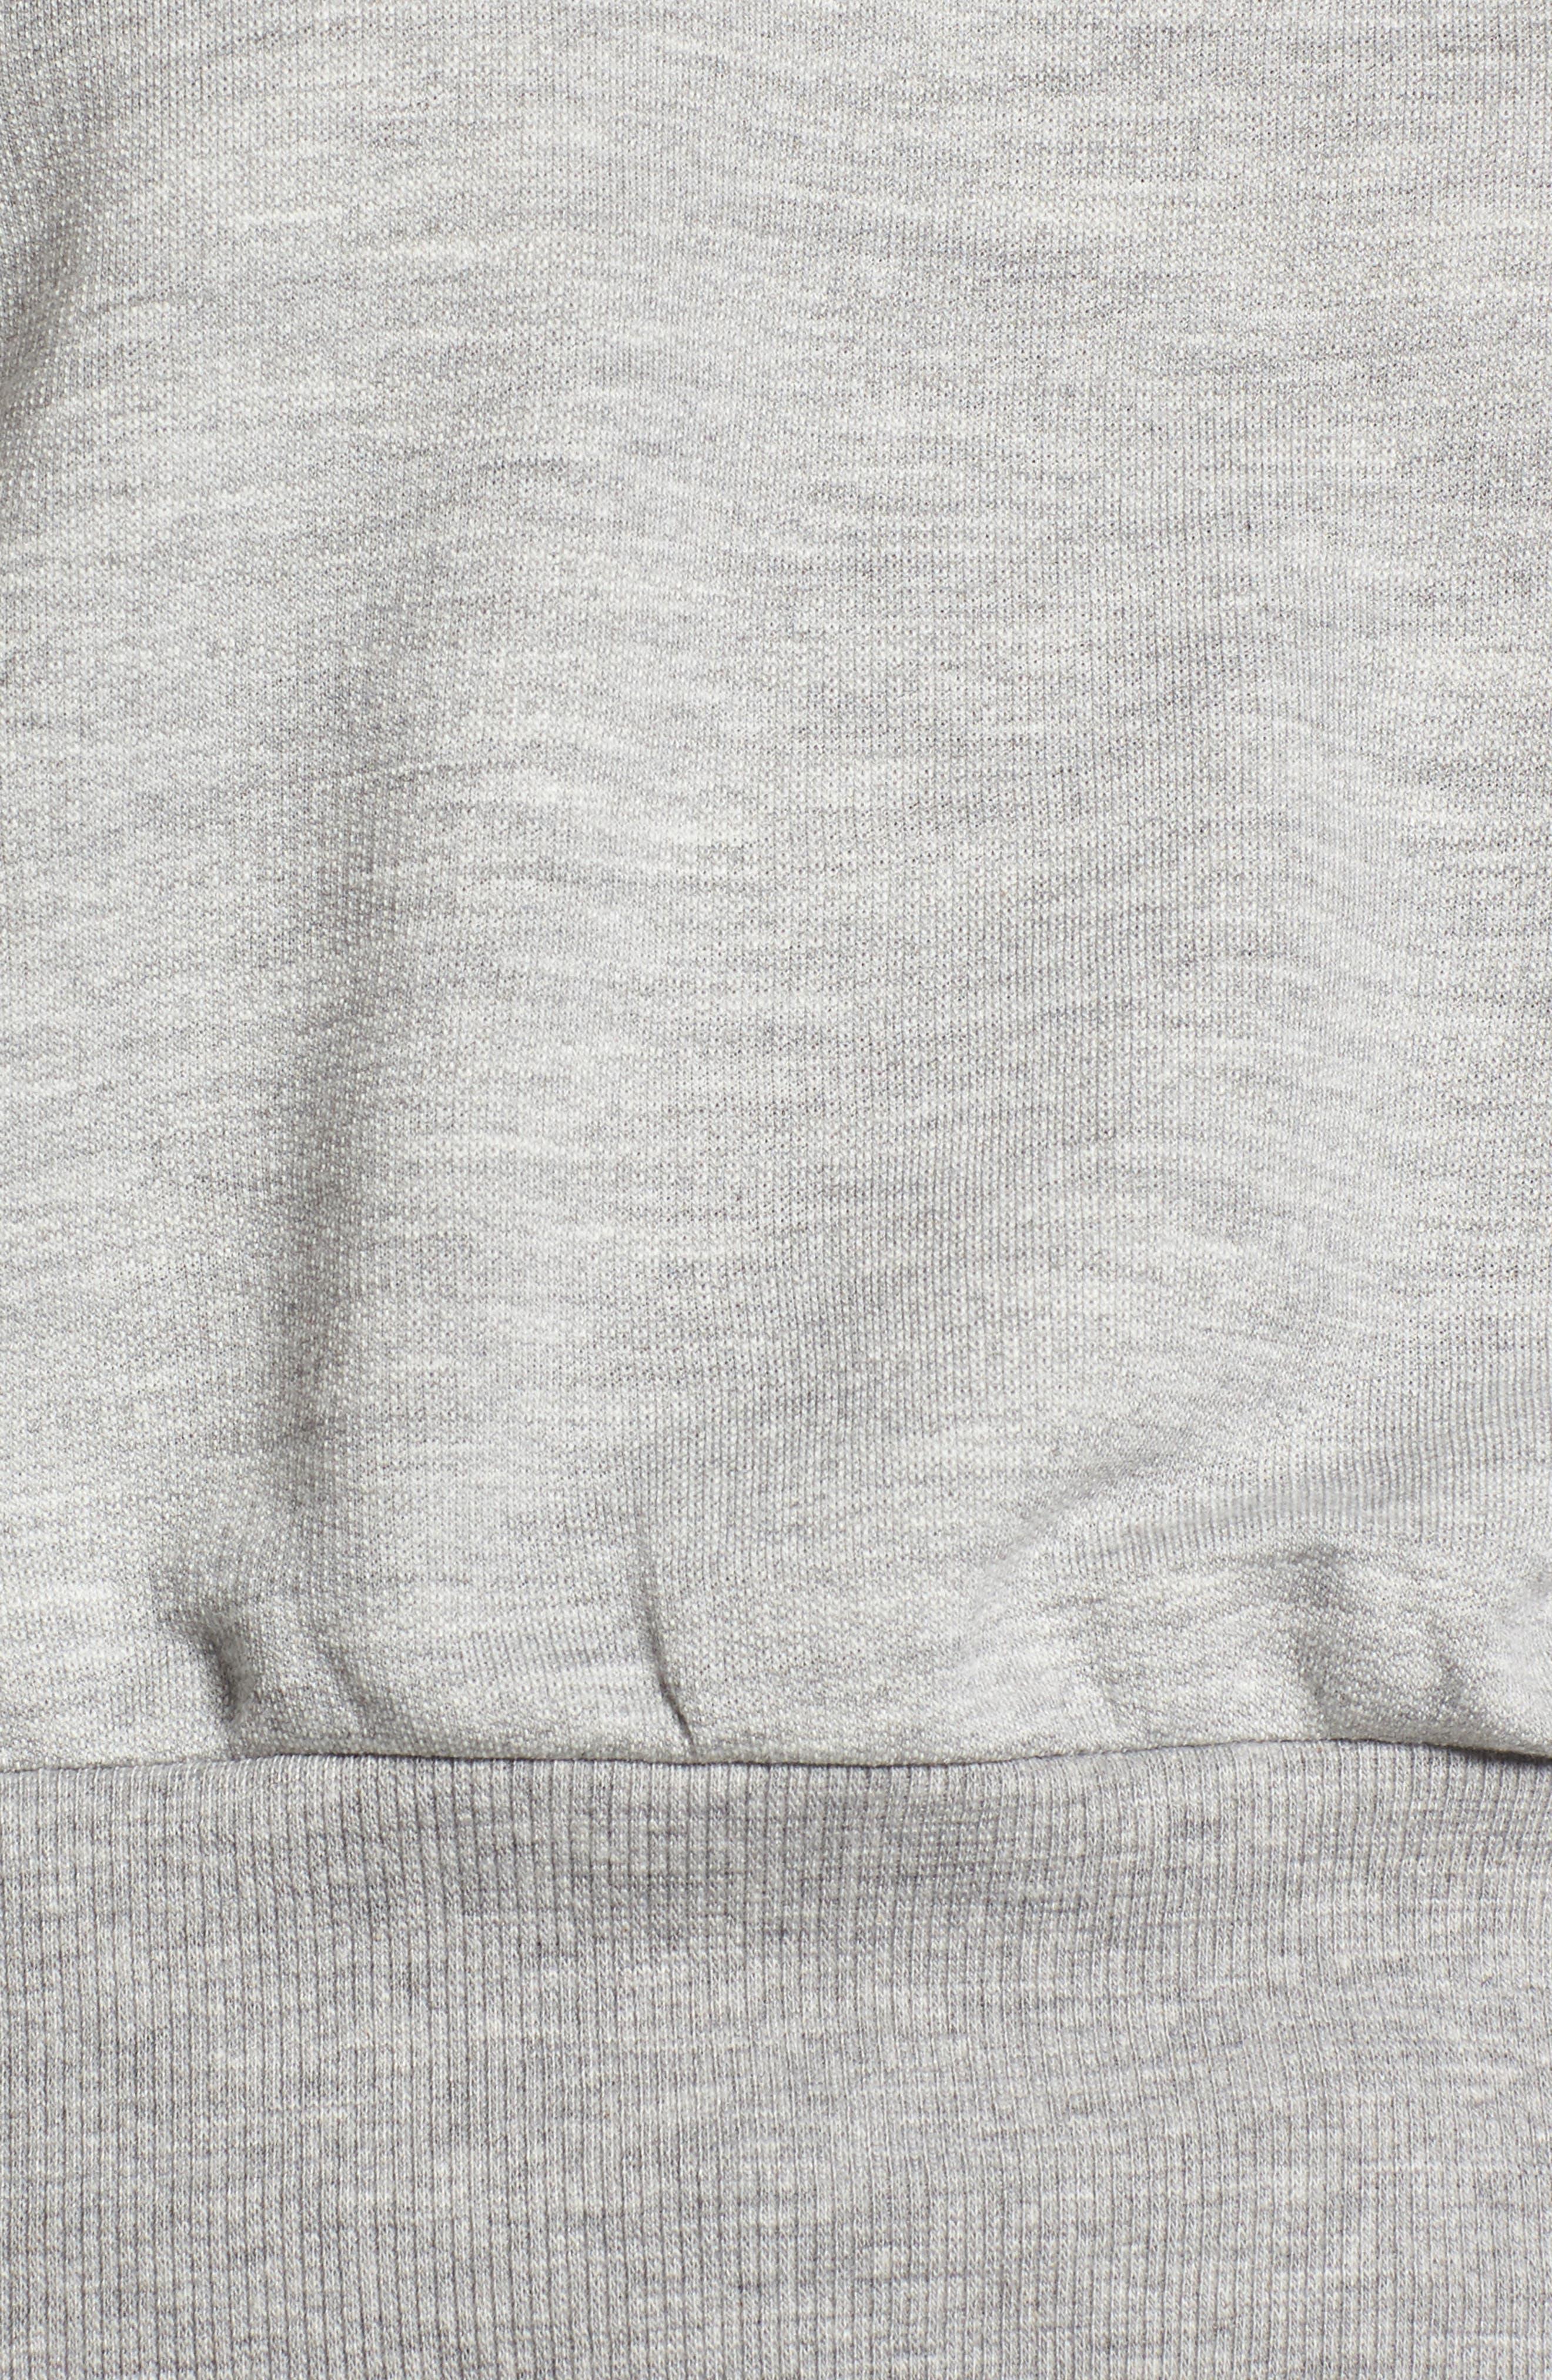 Ruched Sleeve Sweatshirt,                             Alternate thumbnail 15, color,